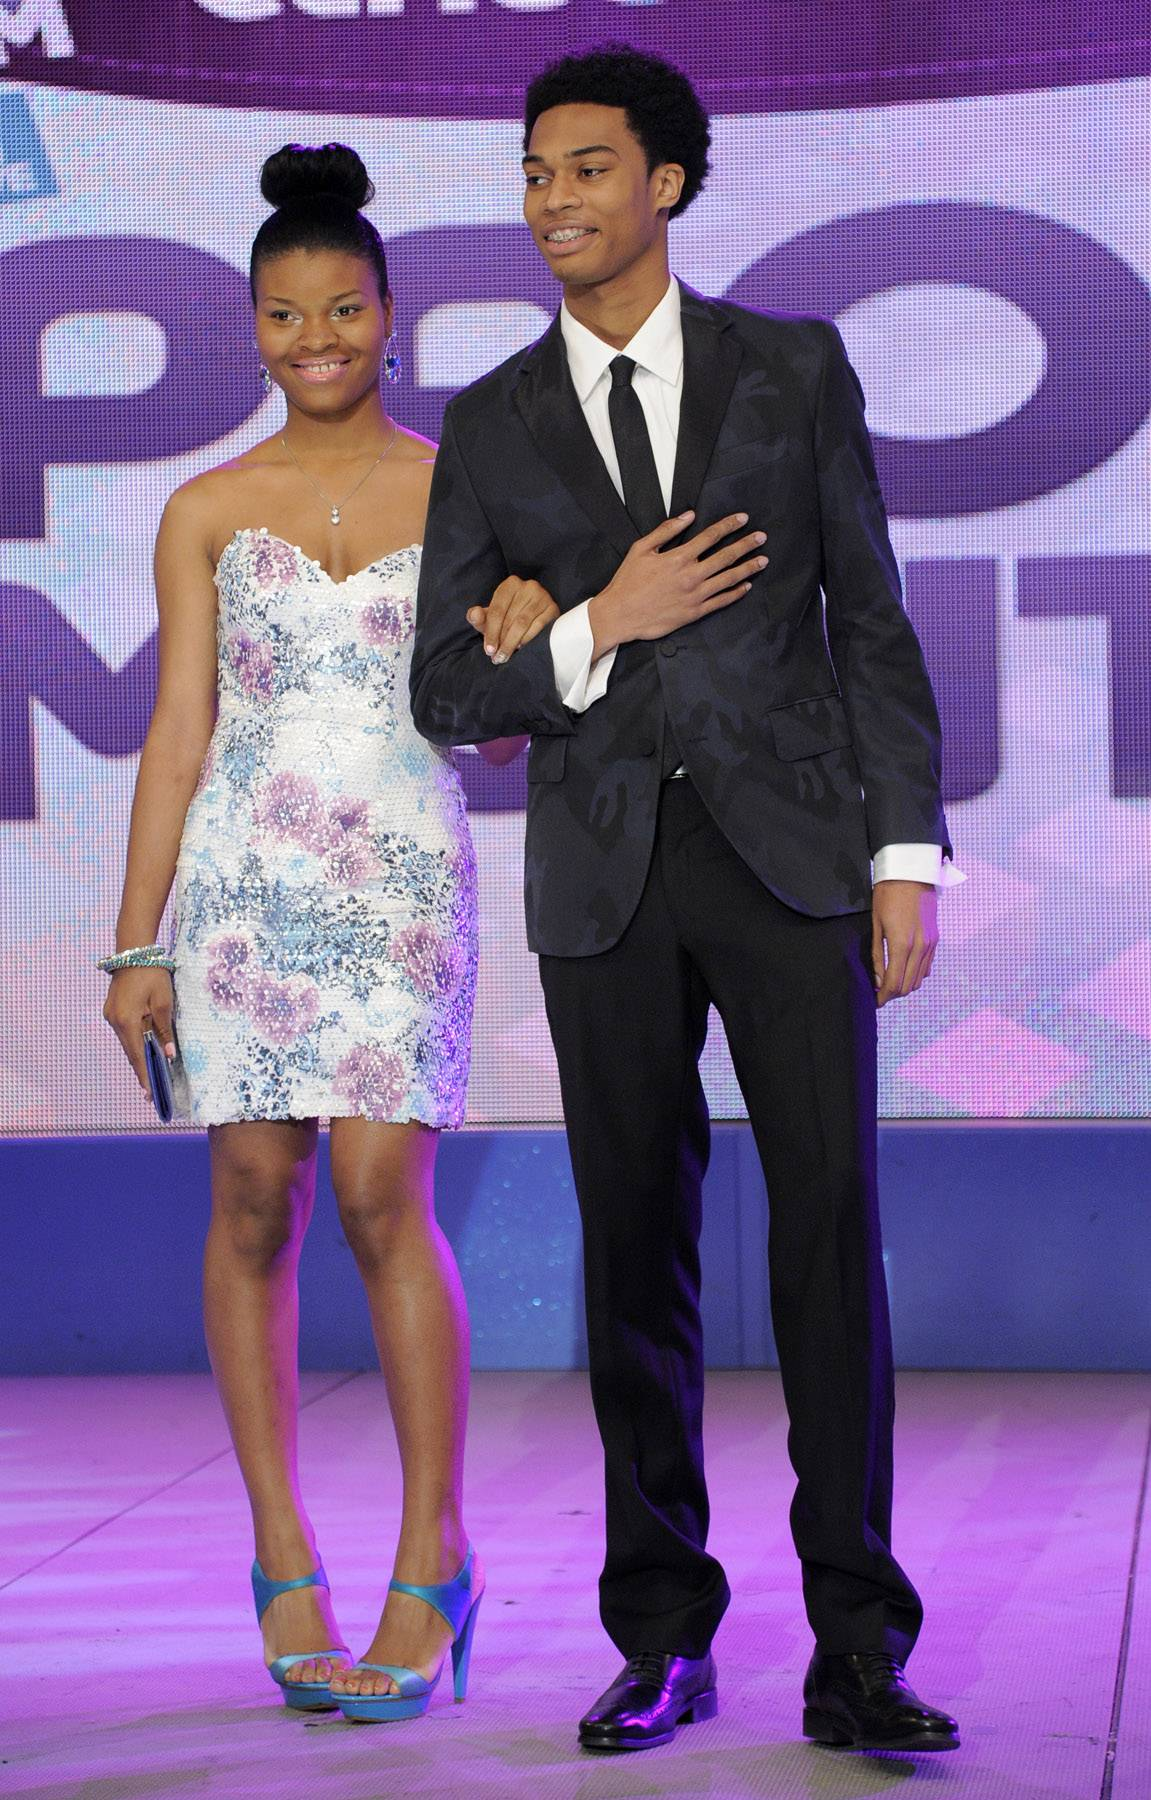 Nice dress - Prom Night fashion show at 106 & Park, May 16, 2012. (Photo: John Ricard / BET)